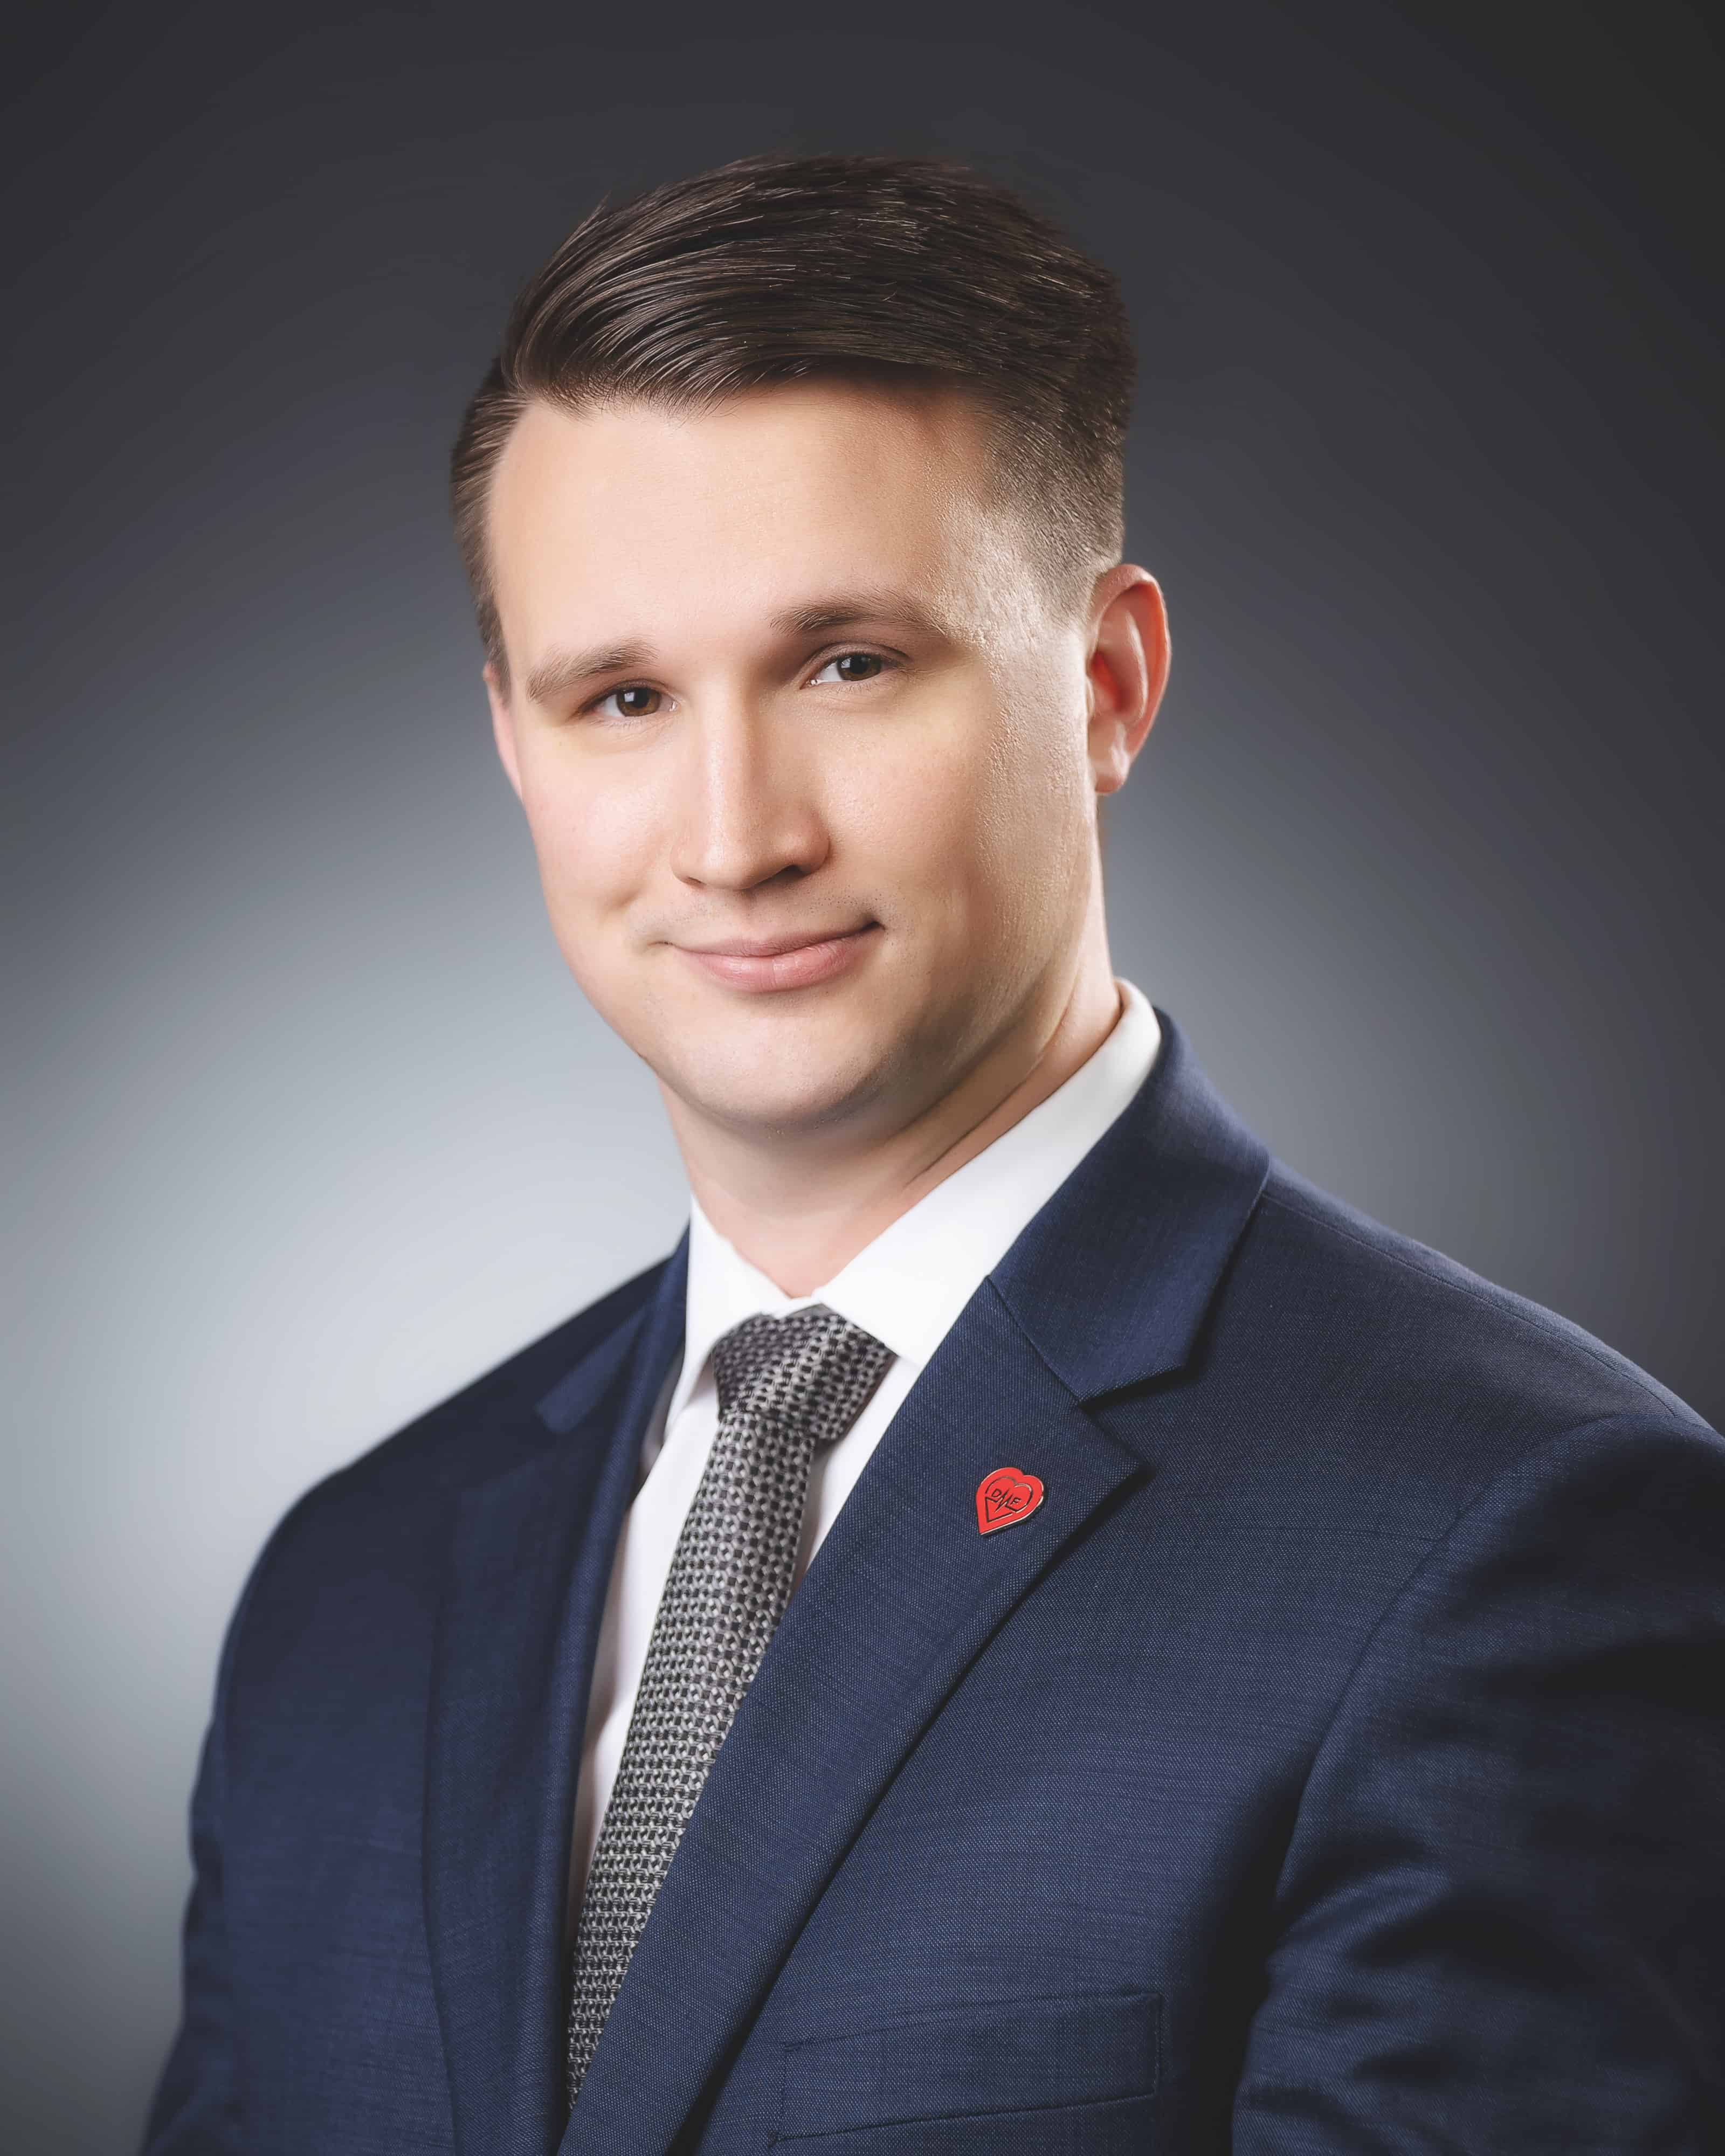 Nate Mickelberg, DMF Communications Director